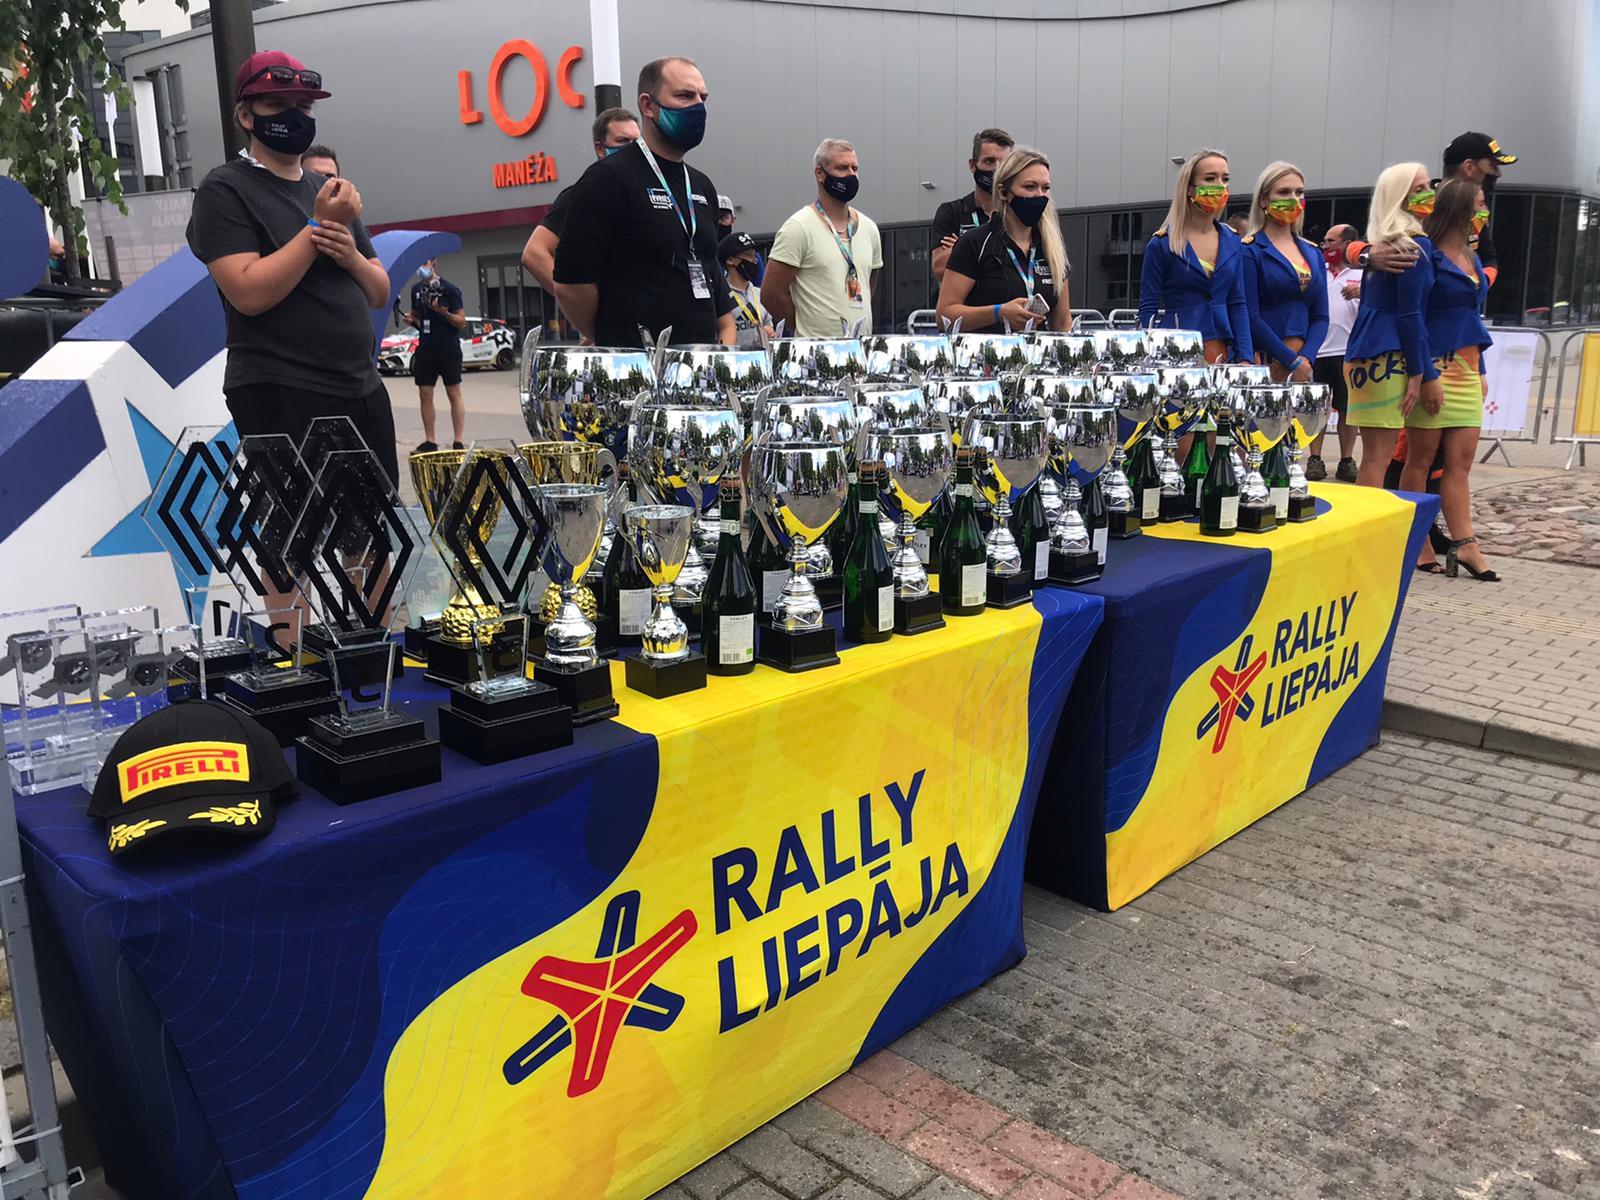 ERC: Rally Liiepaja [1-3 Julio] - Página 2 E5YRiT5XoAworrt?format=jpg&name=large